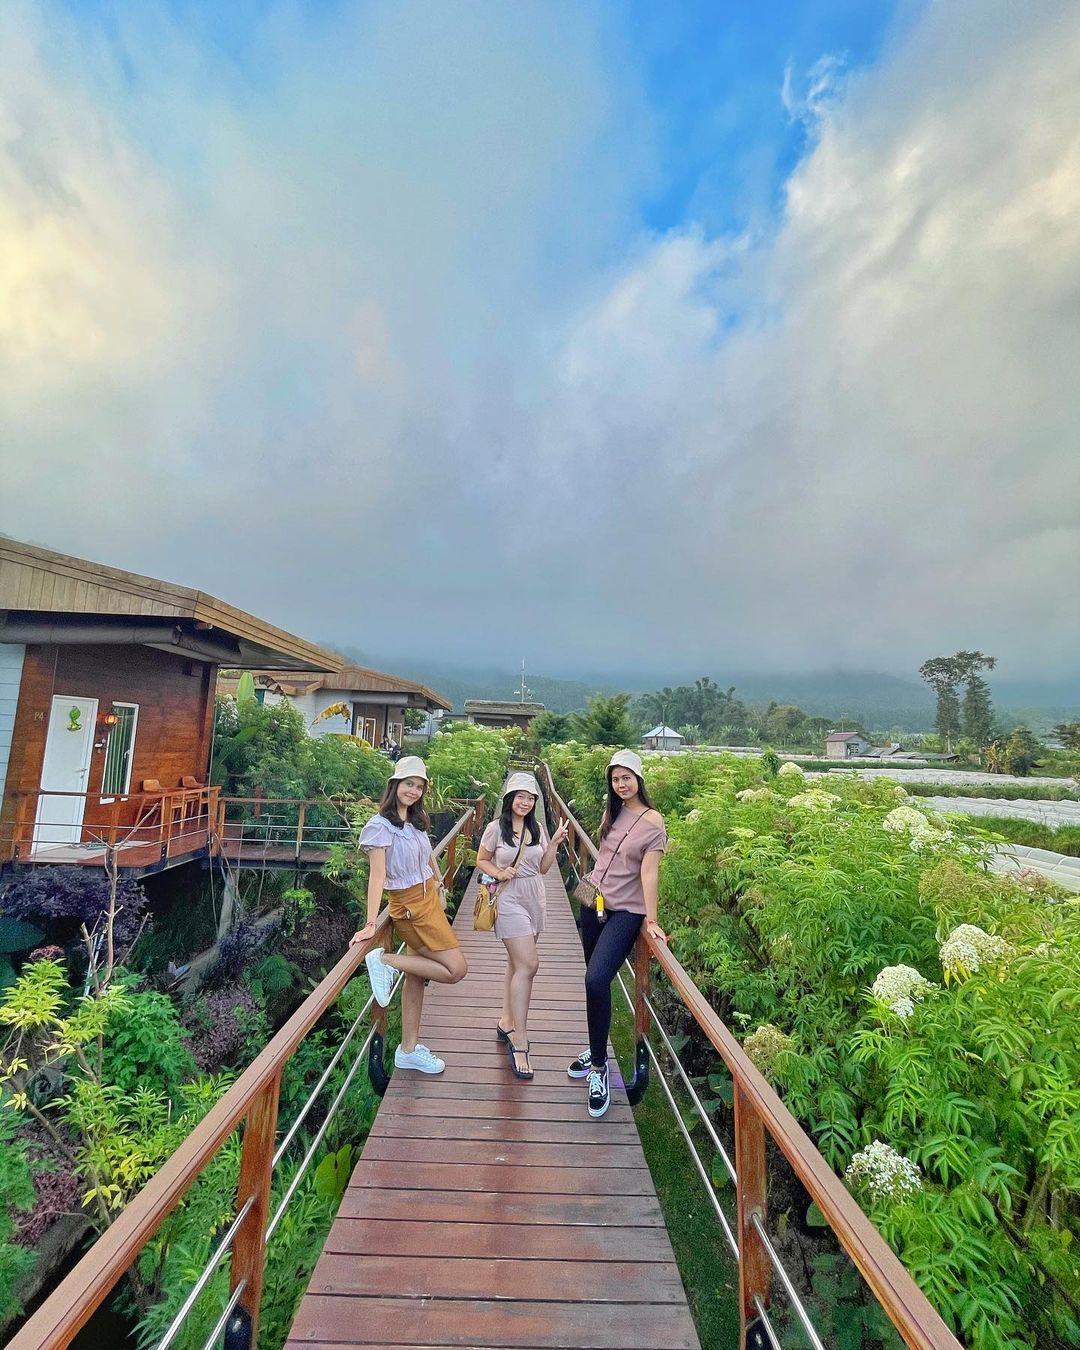 Berfoto Di Pondanu Cabins By The Lake Bedugul Bali Image From @risnaandrianii